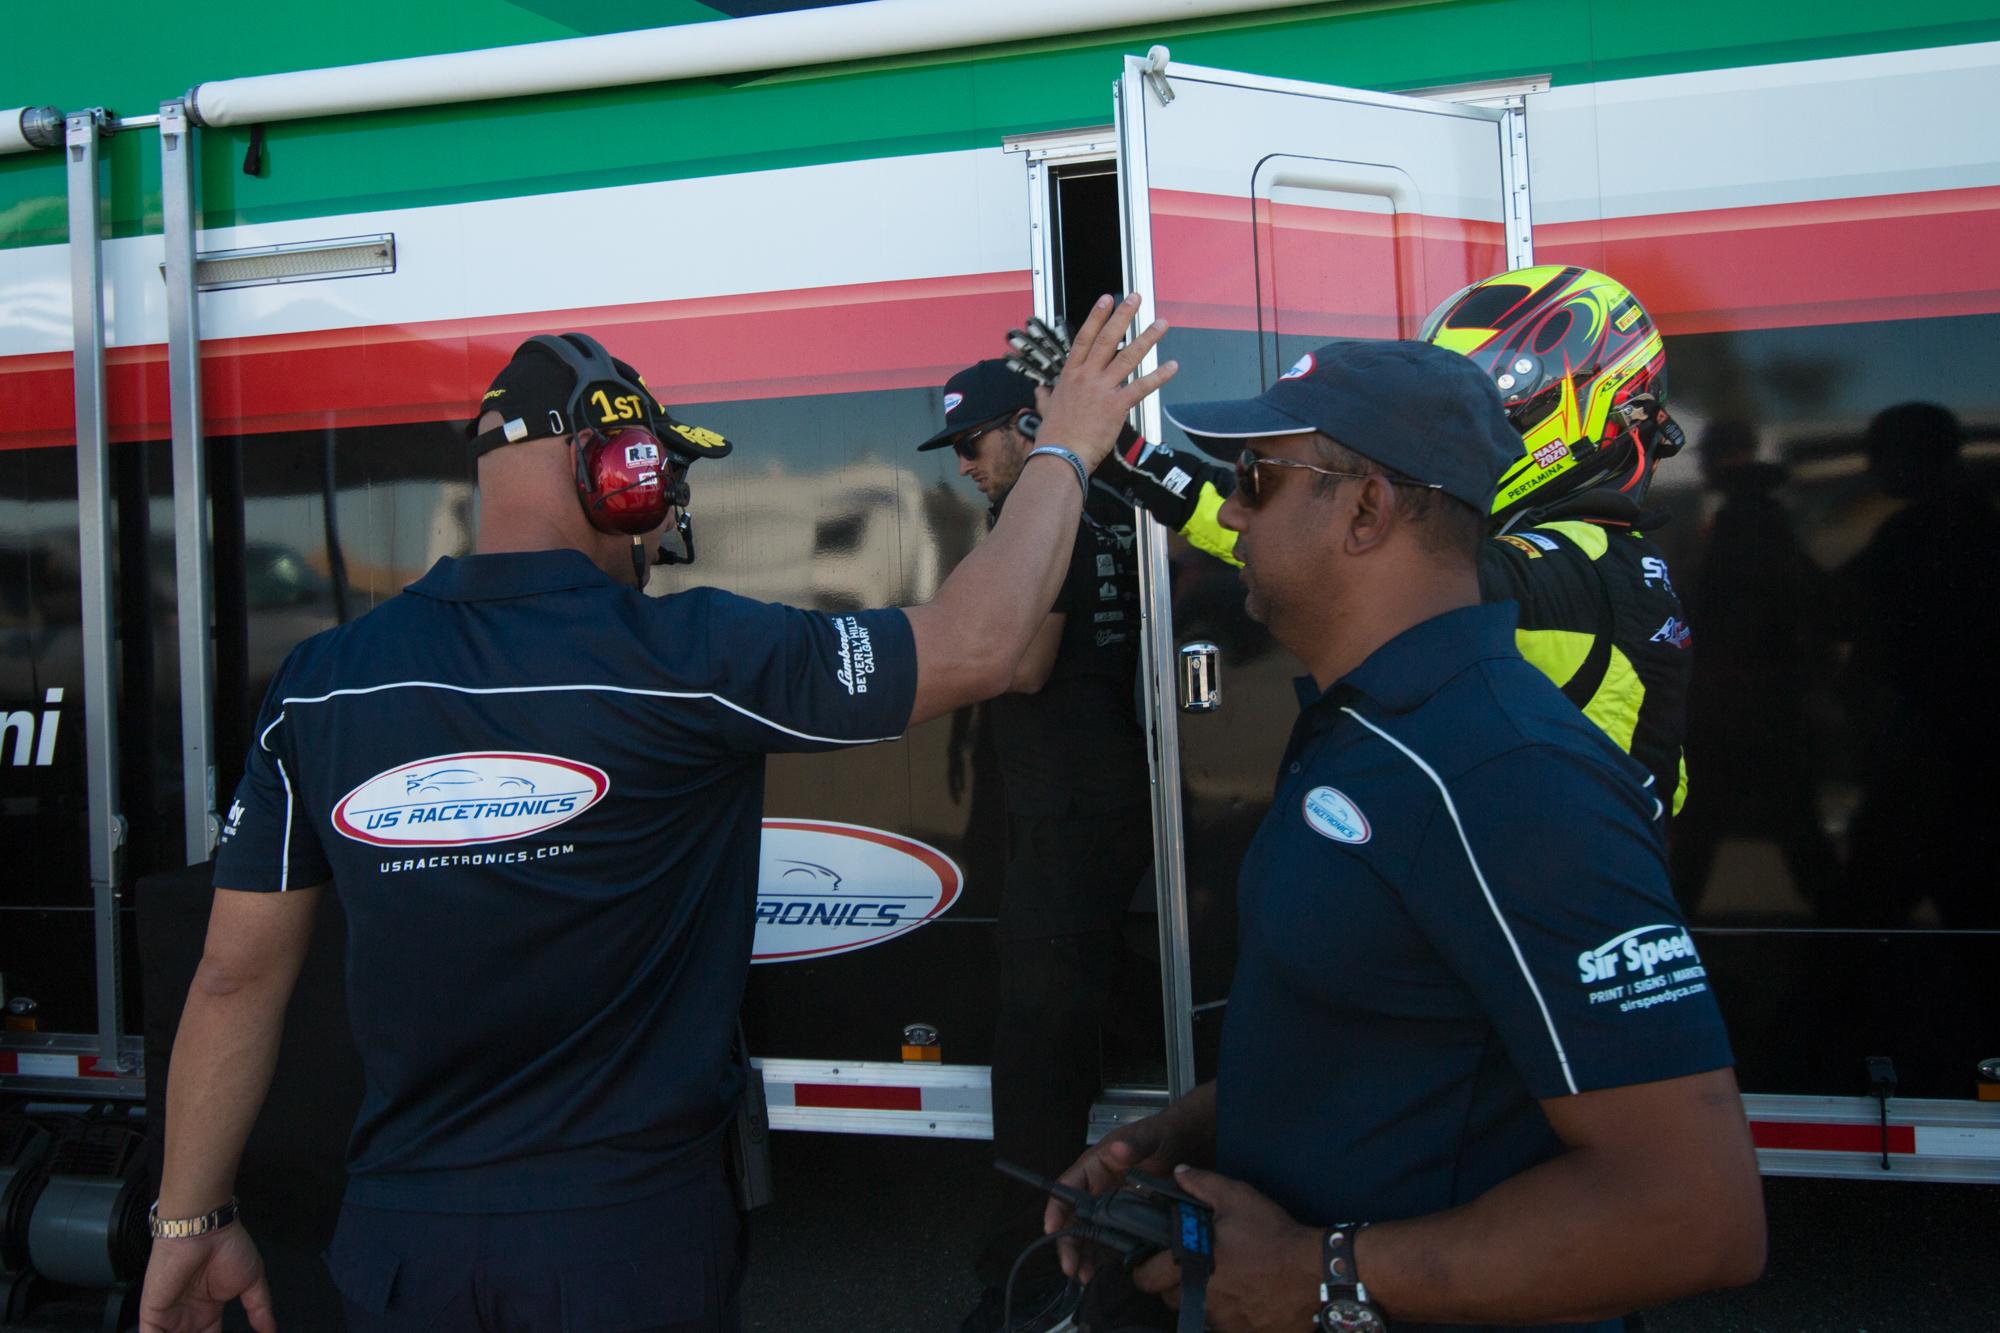 Steven-Racing-20130206-44852.jpg